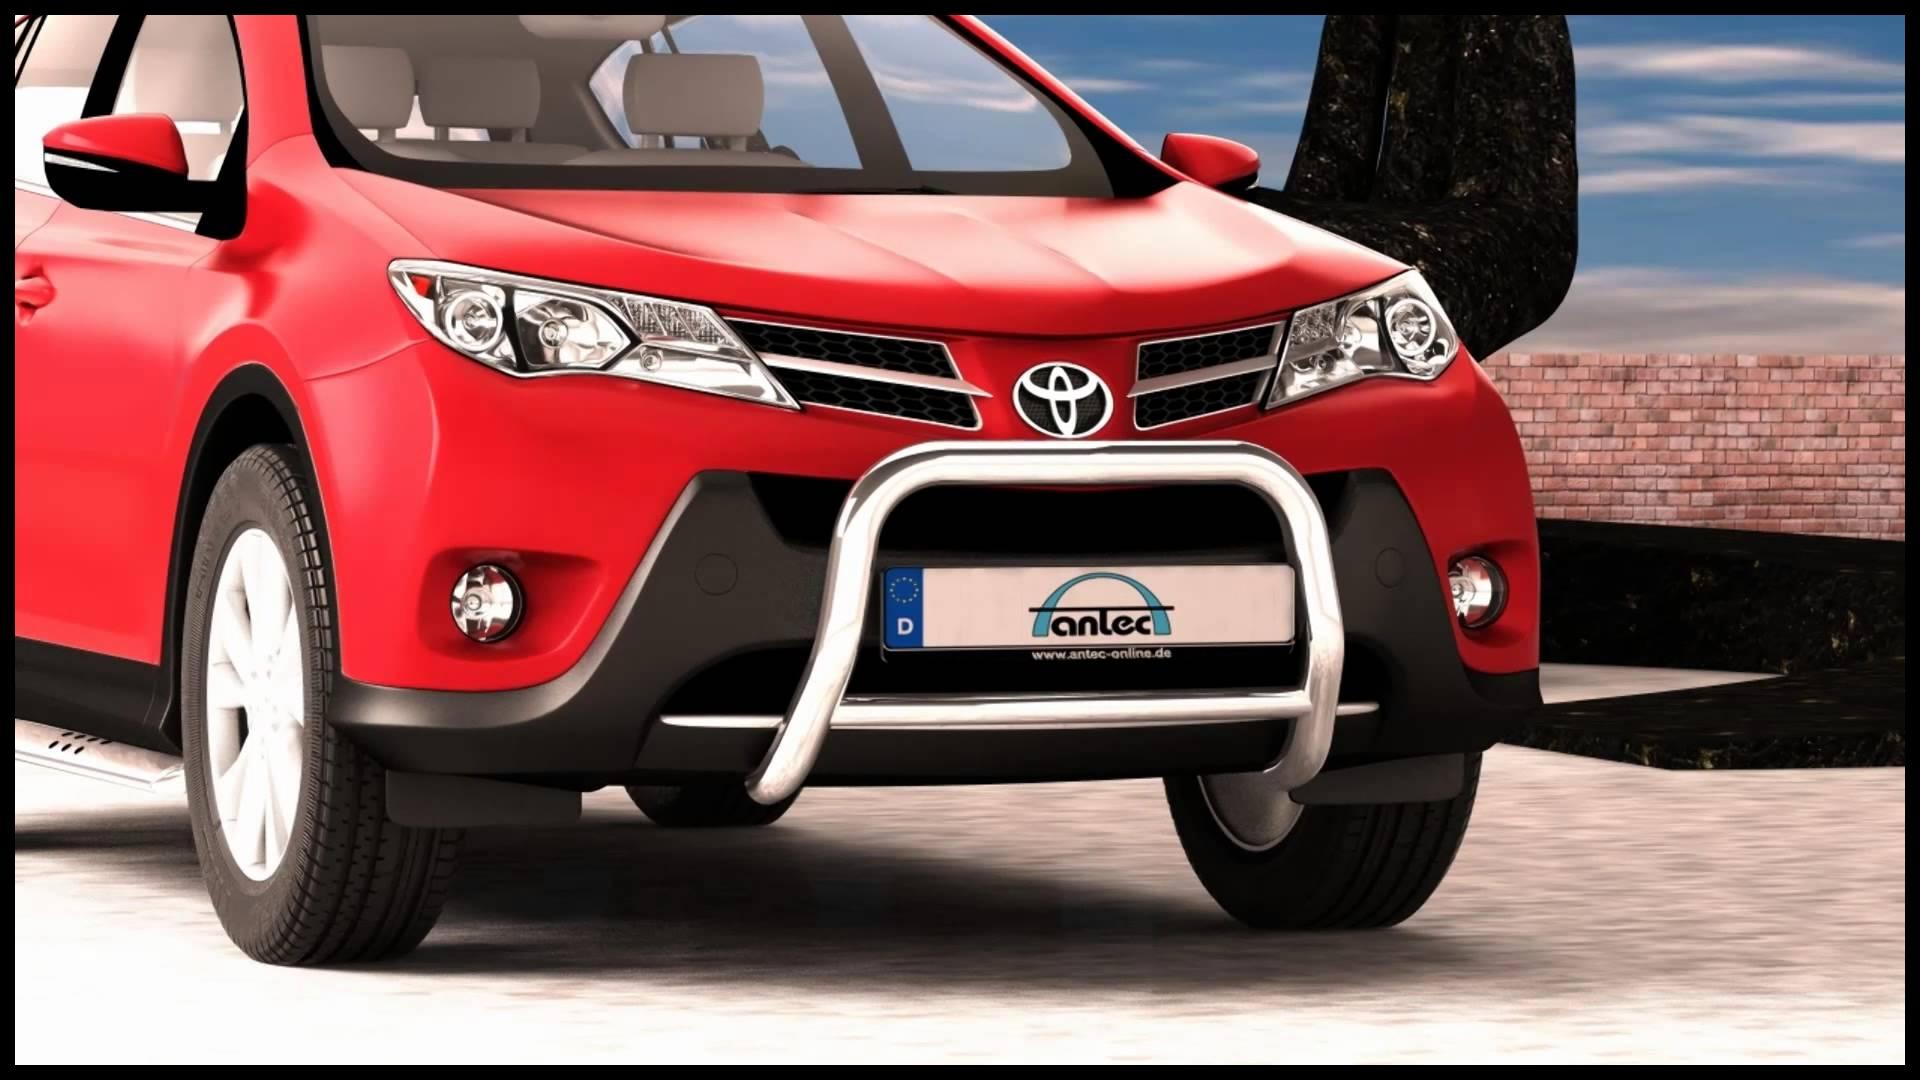 10Z4413 Antec online Toyota RAV4 EU homolog front protection bar